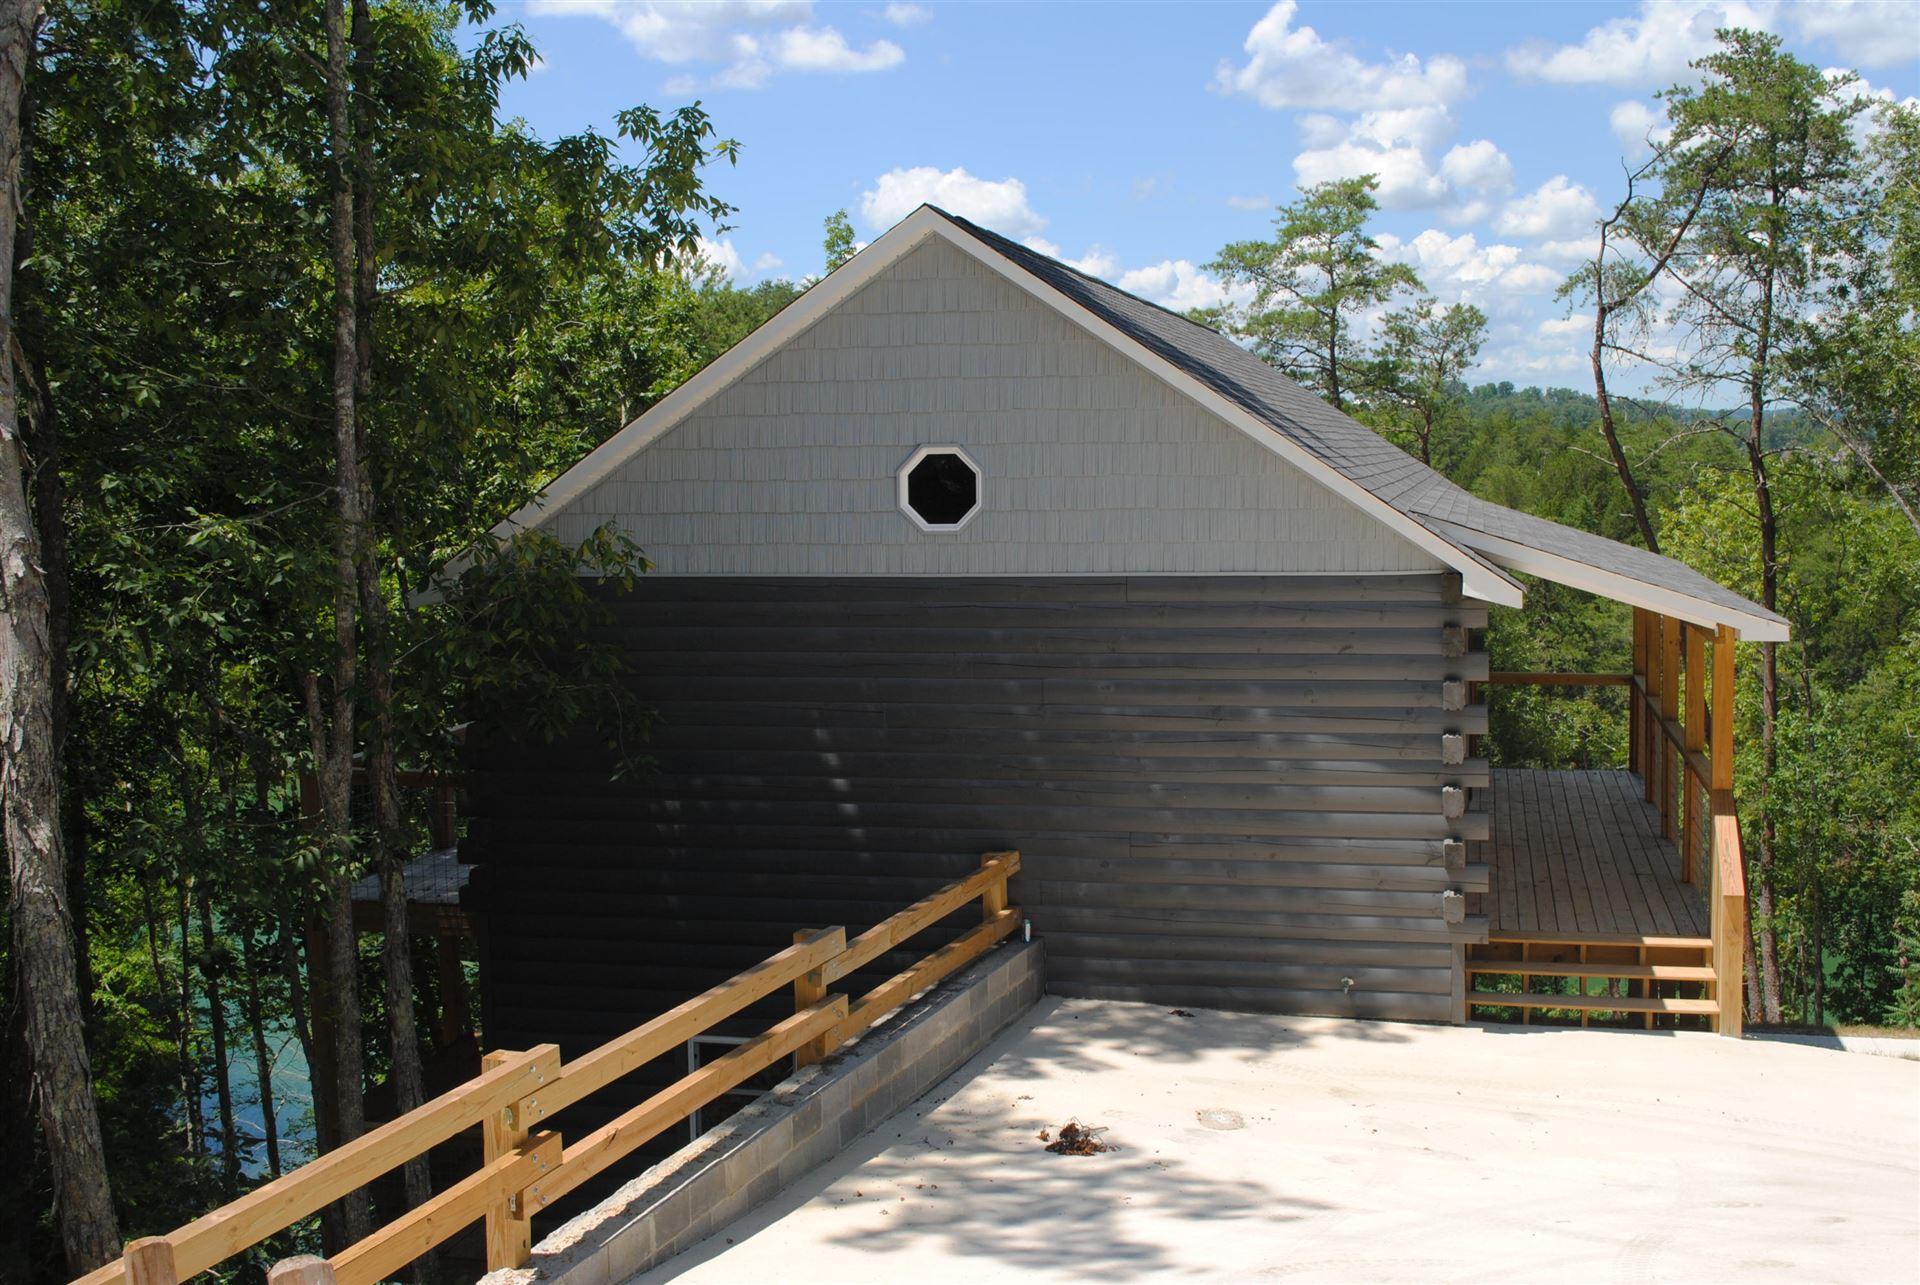 Photo for 1787 Emerald Pointe Blvd, Sevierville, TN 37876 (MLS # 1123281)